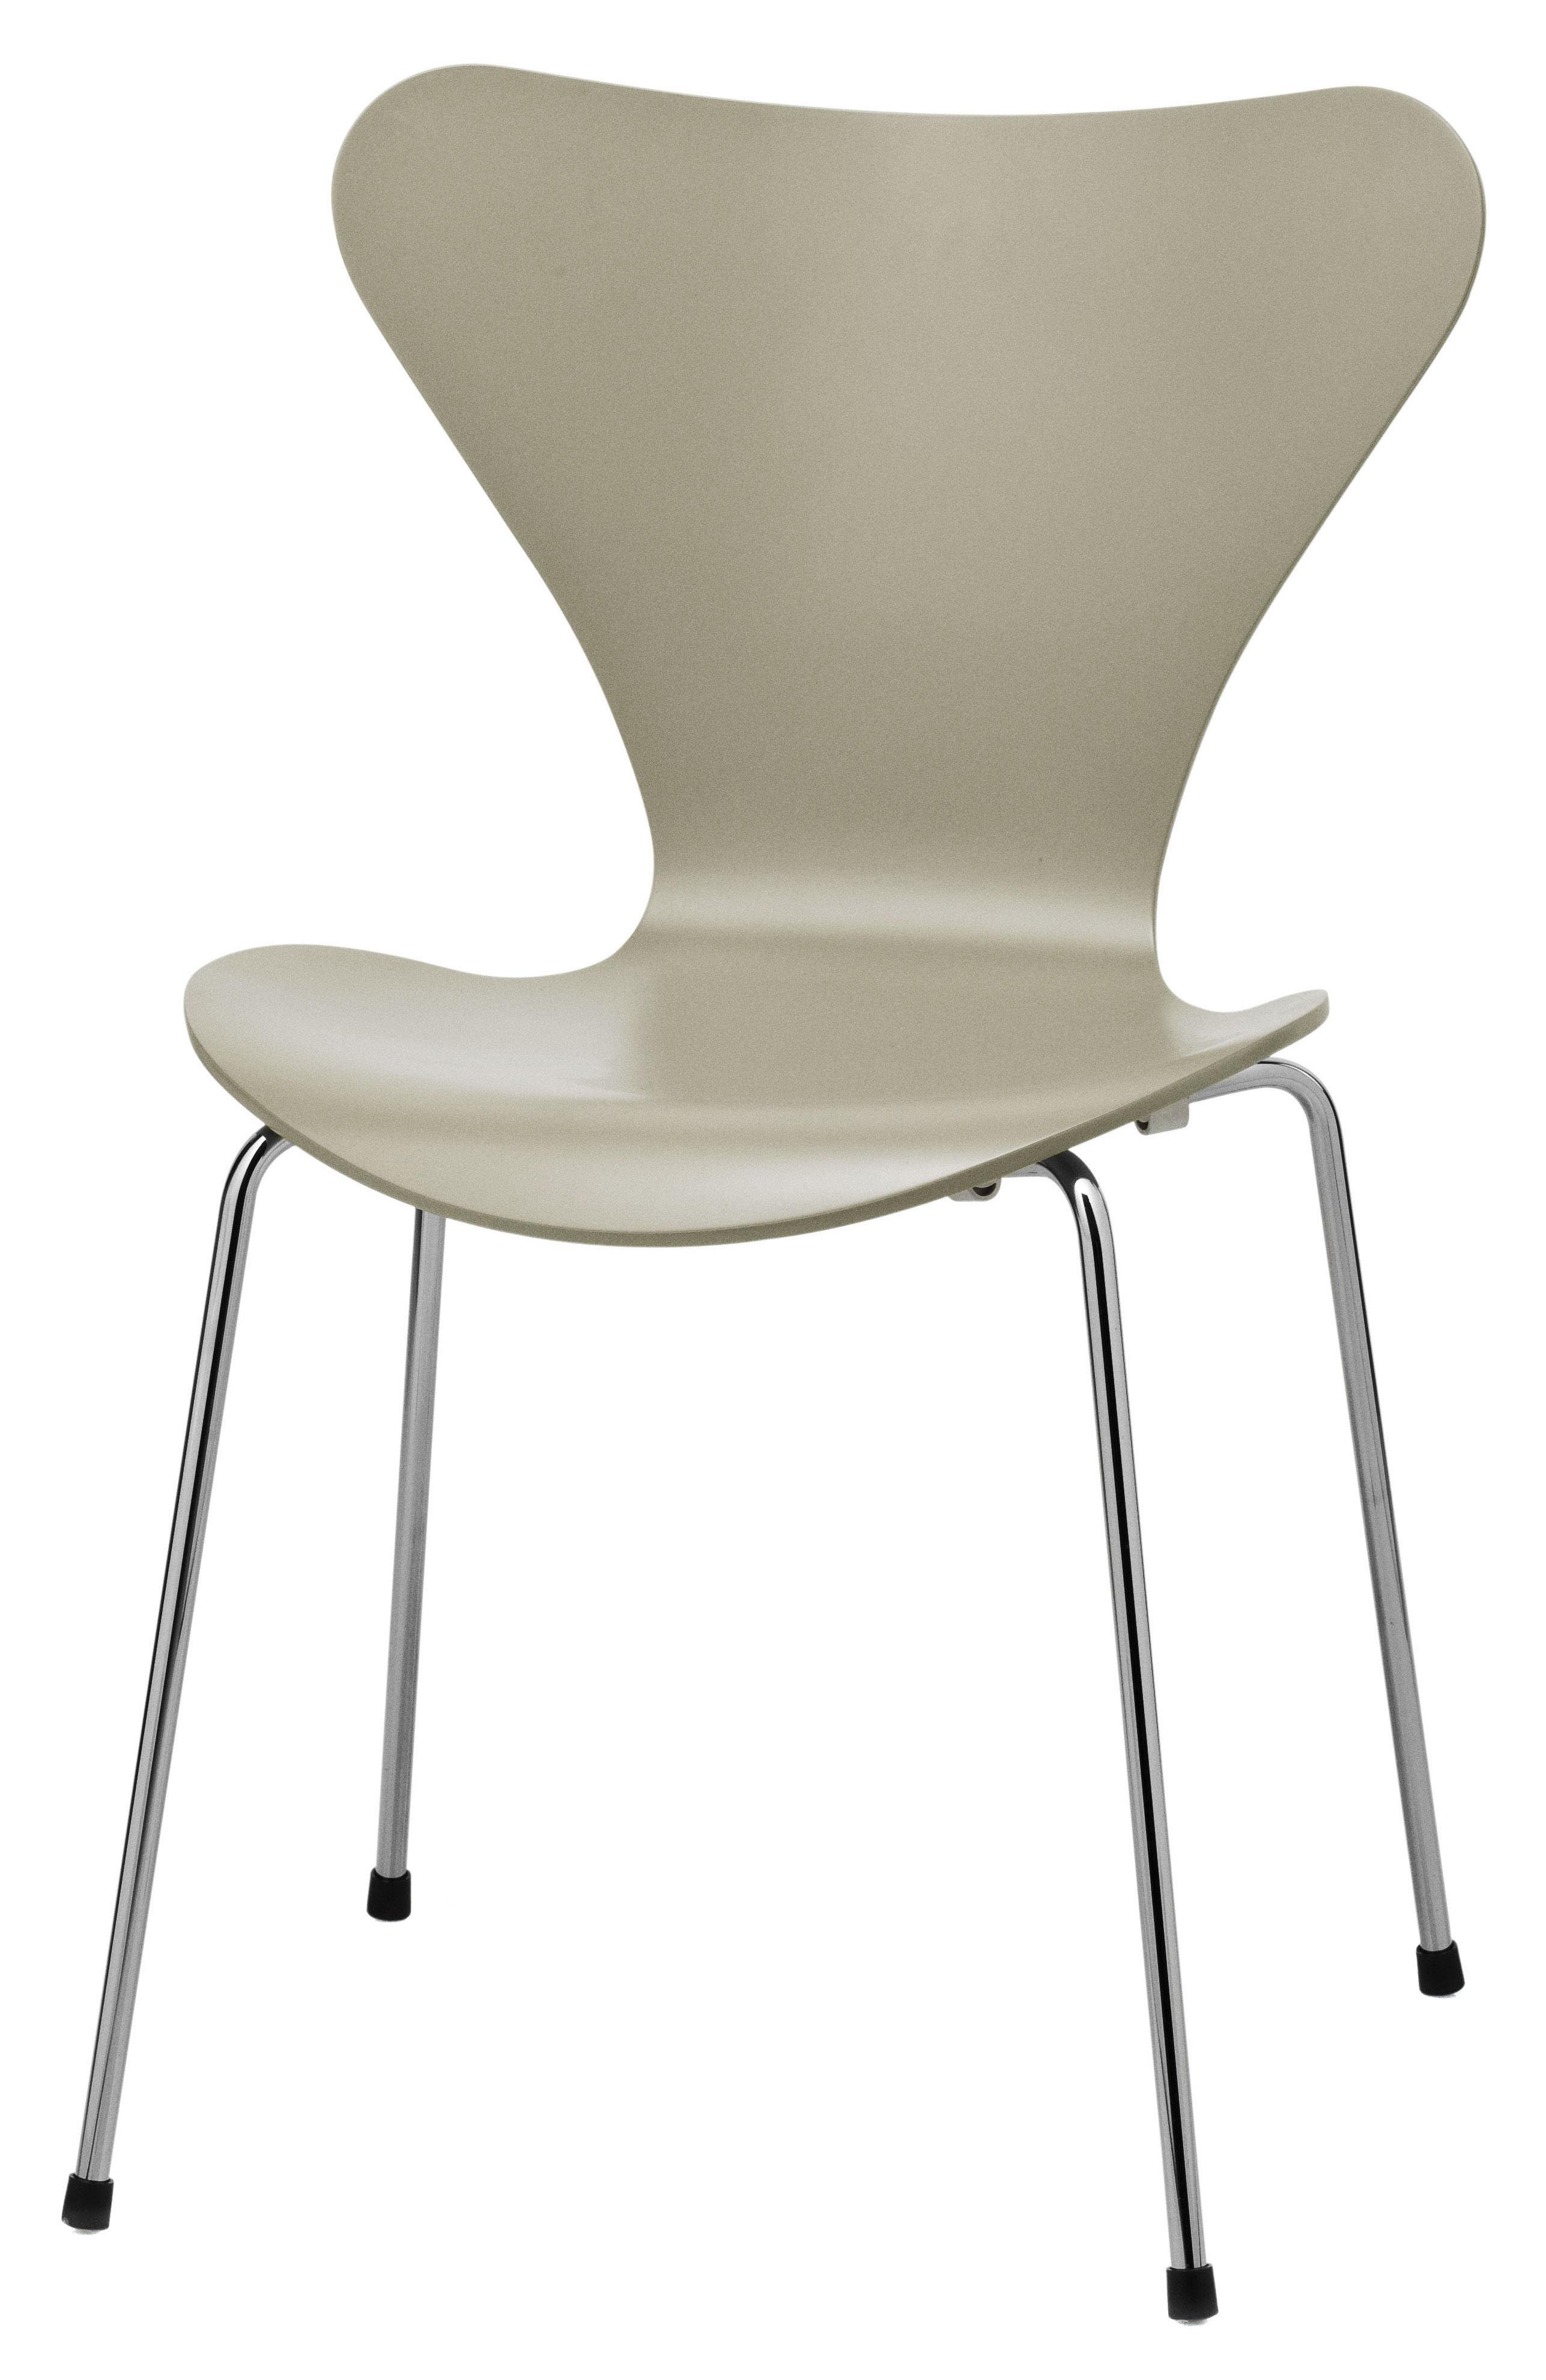 chaise empilable s rie 7 laqu e coloris exclusif gris olive fritz hansen. Black Bedroom Furniture Sets. Home Design Ideas